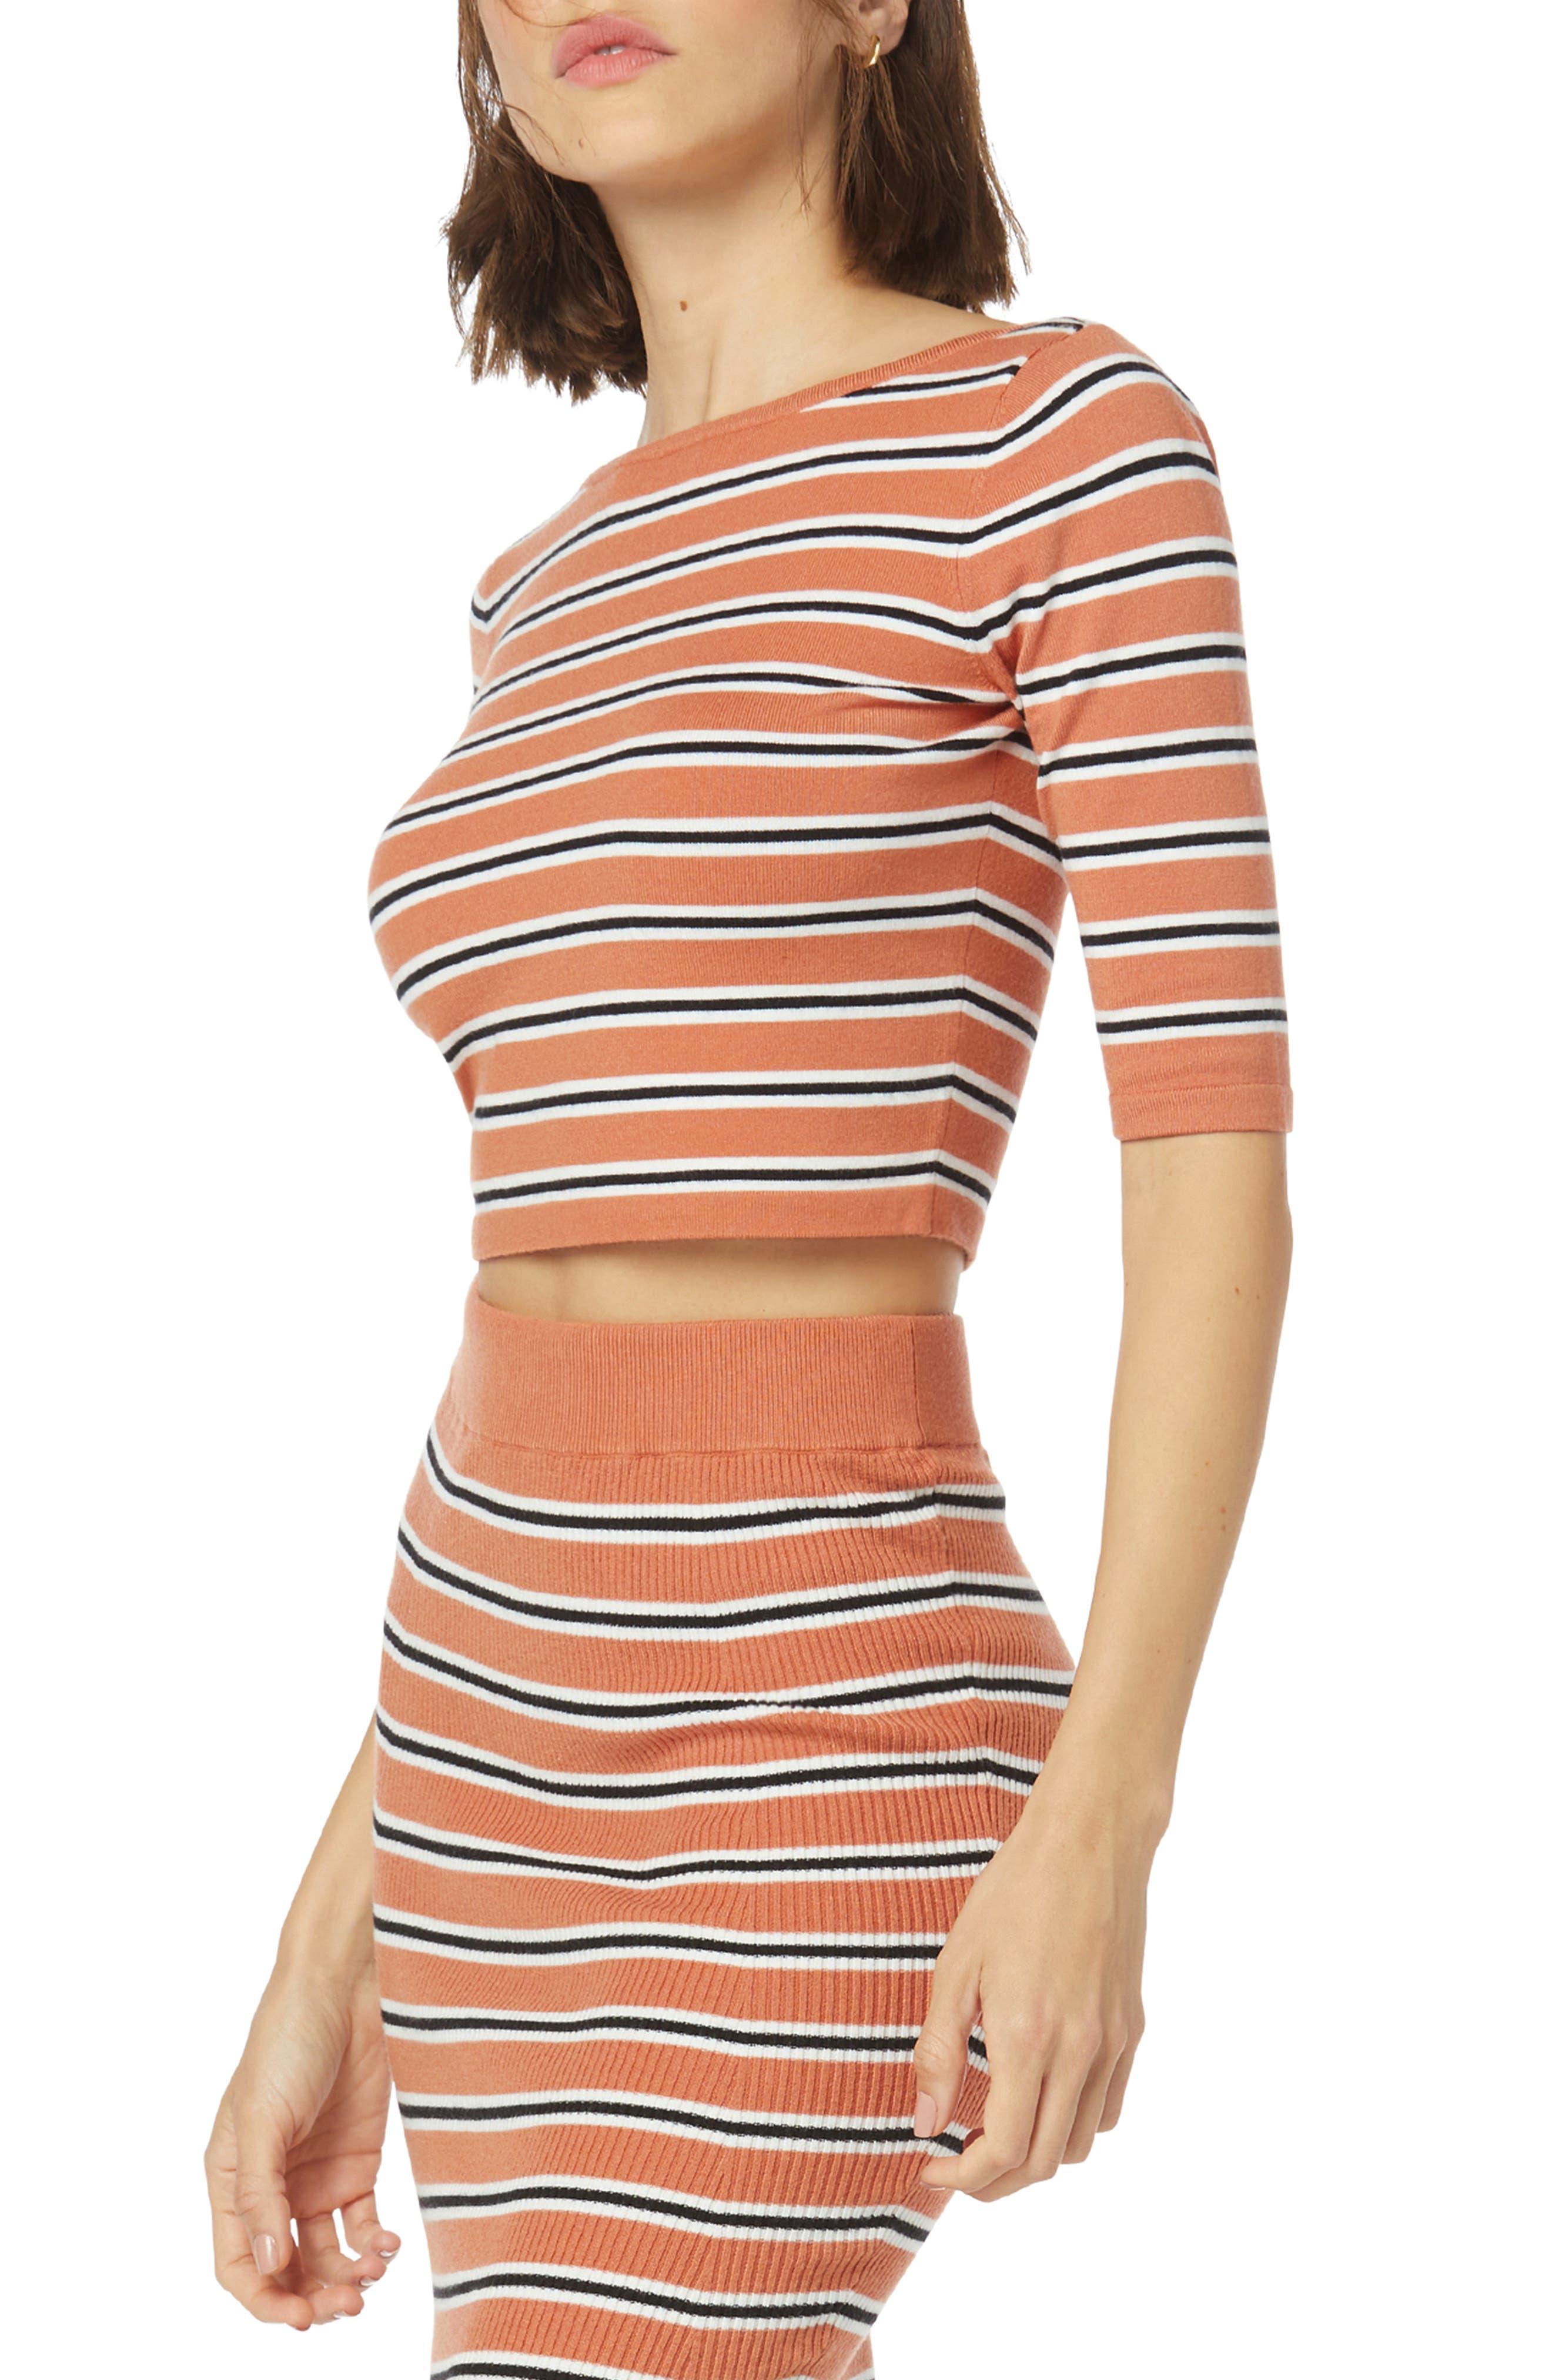 The Revenge Stripe Crop Knit Top